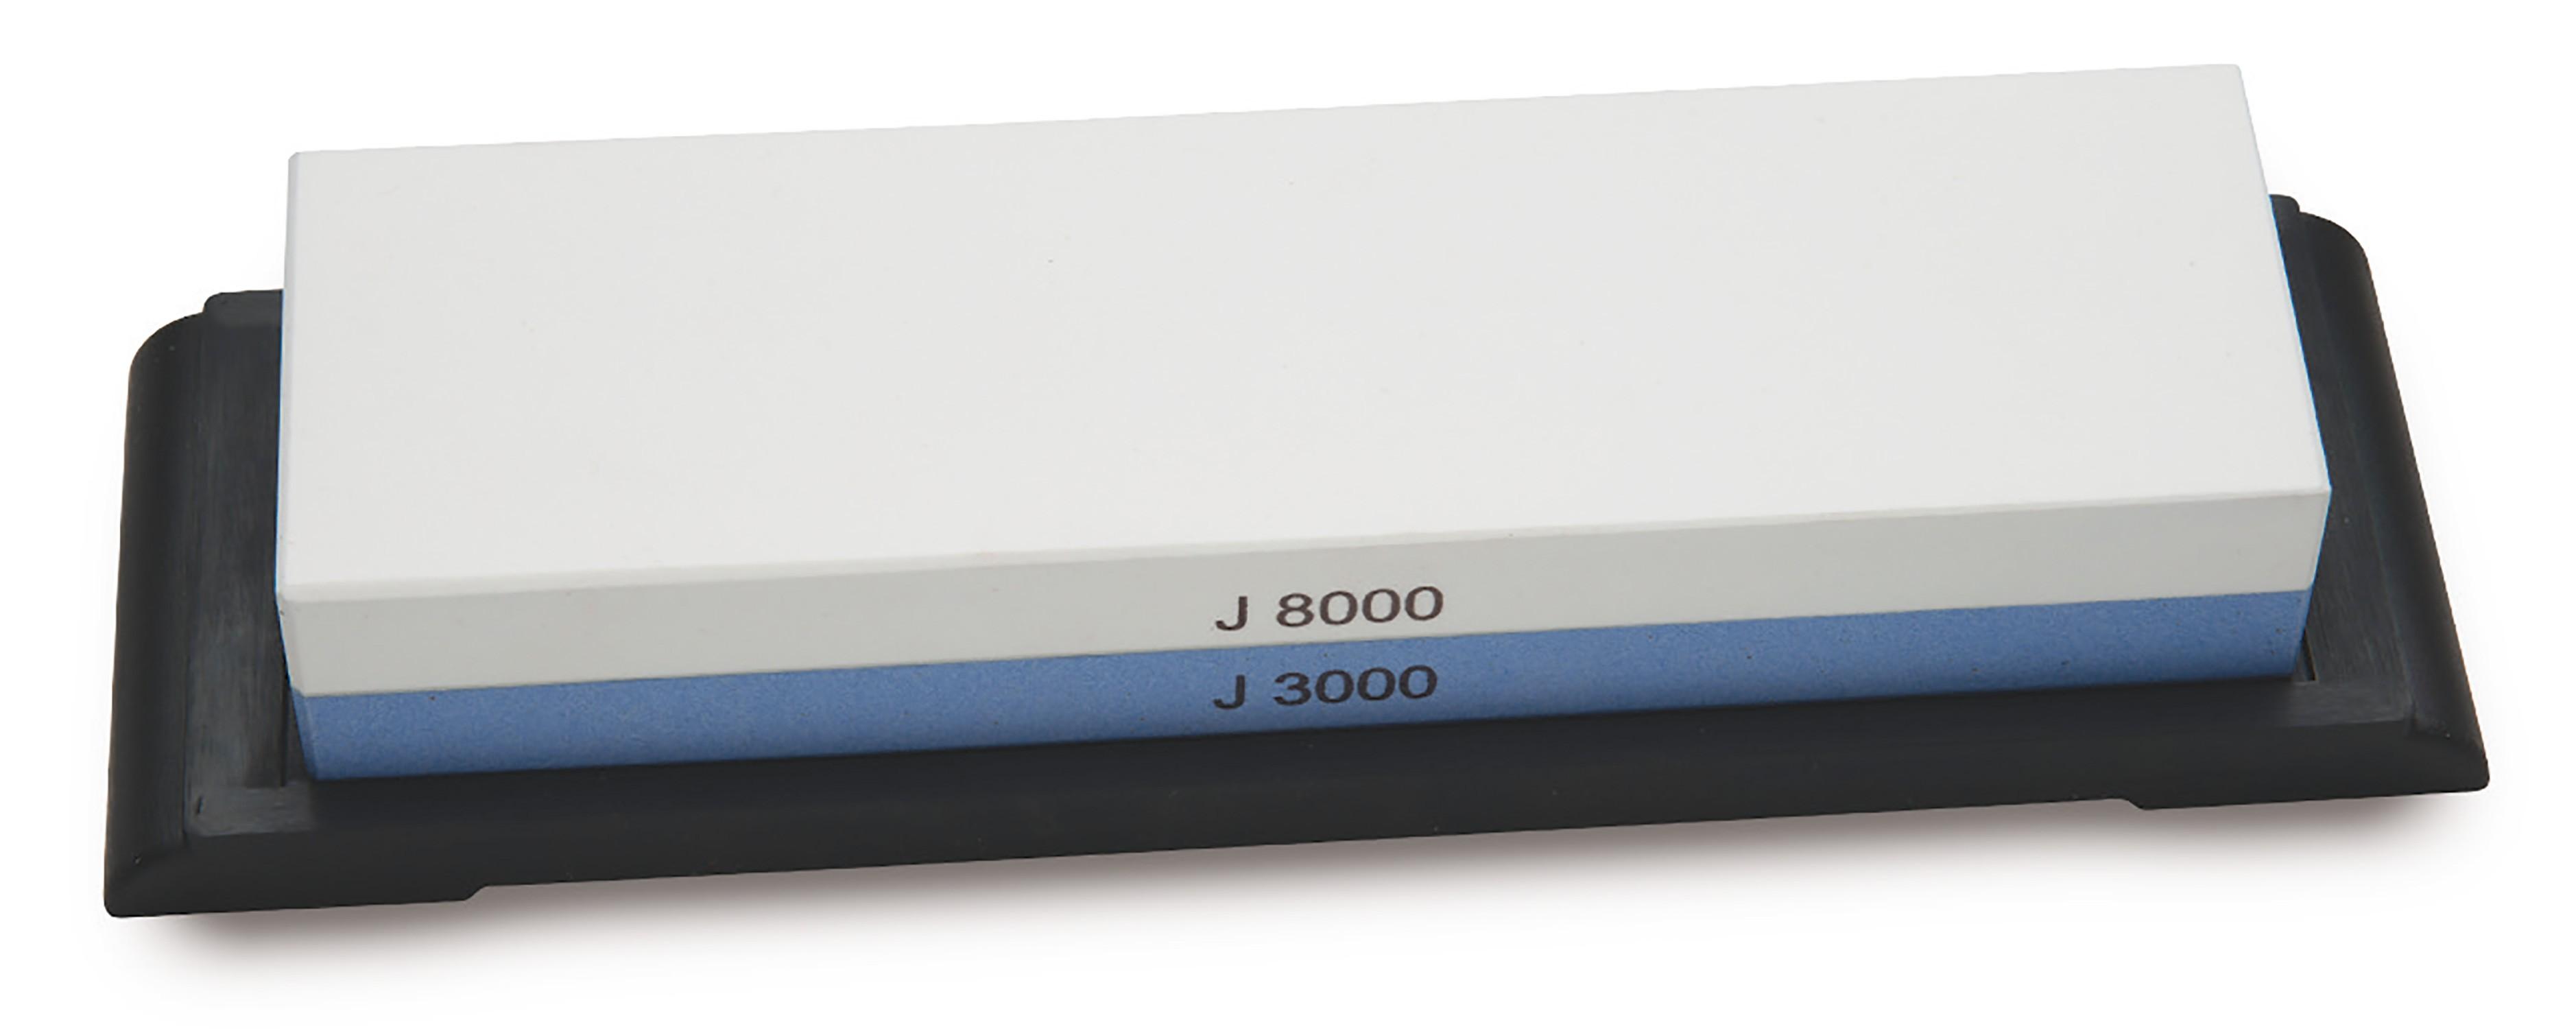 Wüsthof Abziehstein J 3000 - 8000